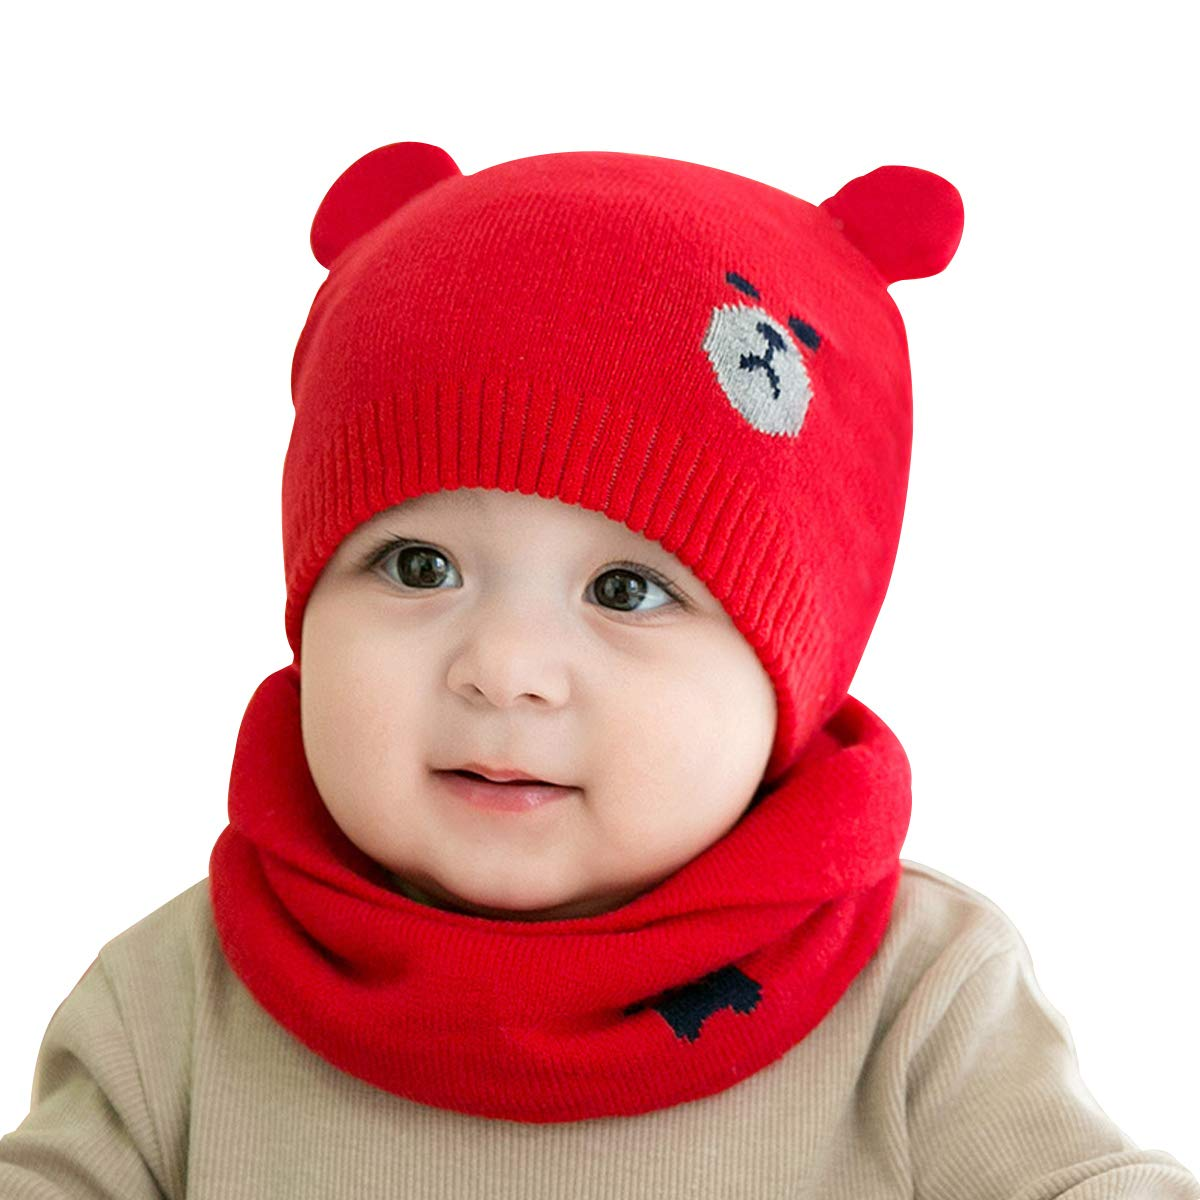 cjixnji Baby Boy Girl Cute Baby Winter Hats Scarfs Set, Children Toddler Warm Beanie Hat Knit Soft Cotton Caps Scarves for Infant Kids 0-36 Months Children Toddler Warm Beanie Hat Knit Soft Cotton Caps Scarves Infant Kids 0-36 Months (Beige)